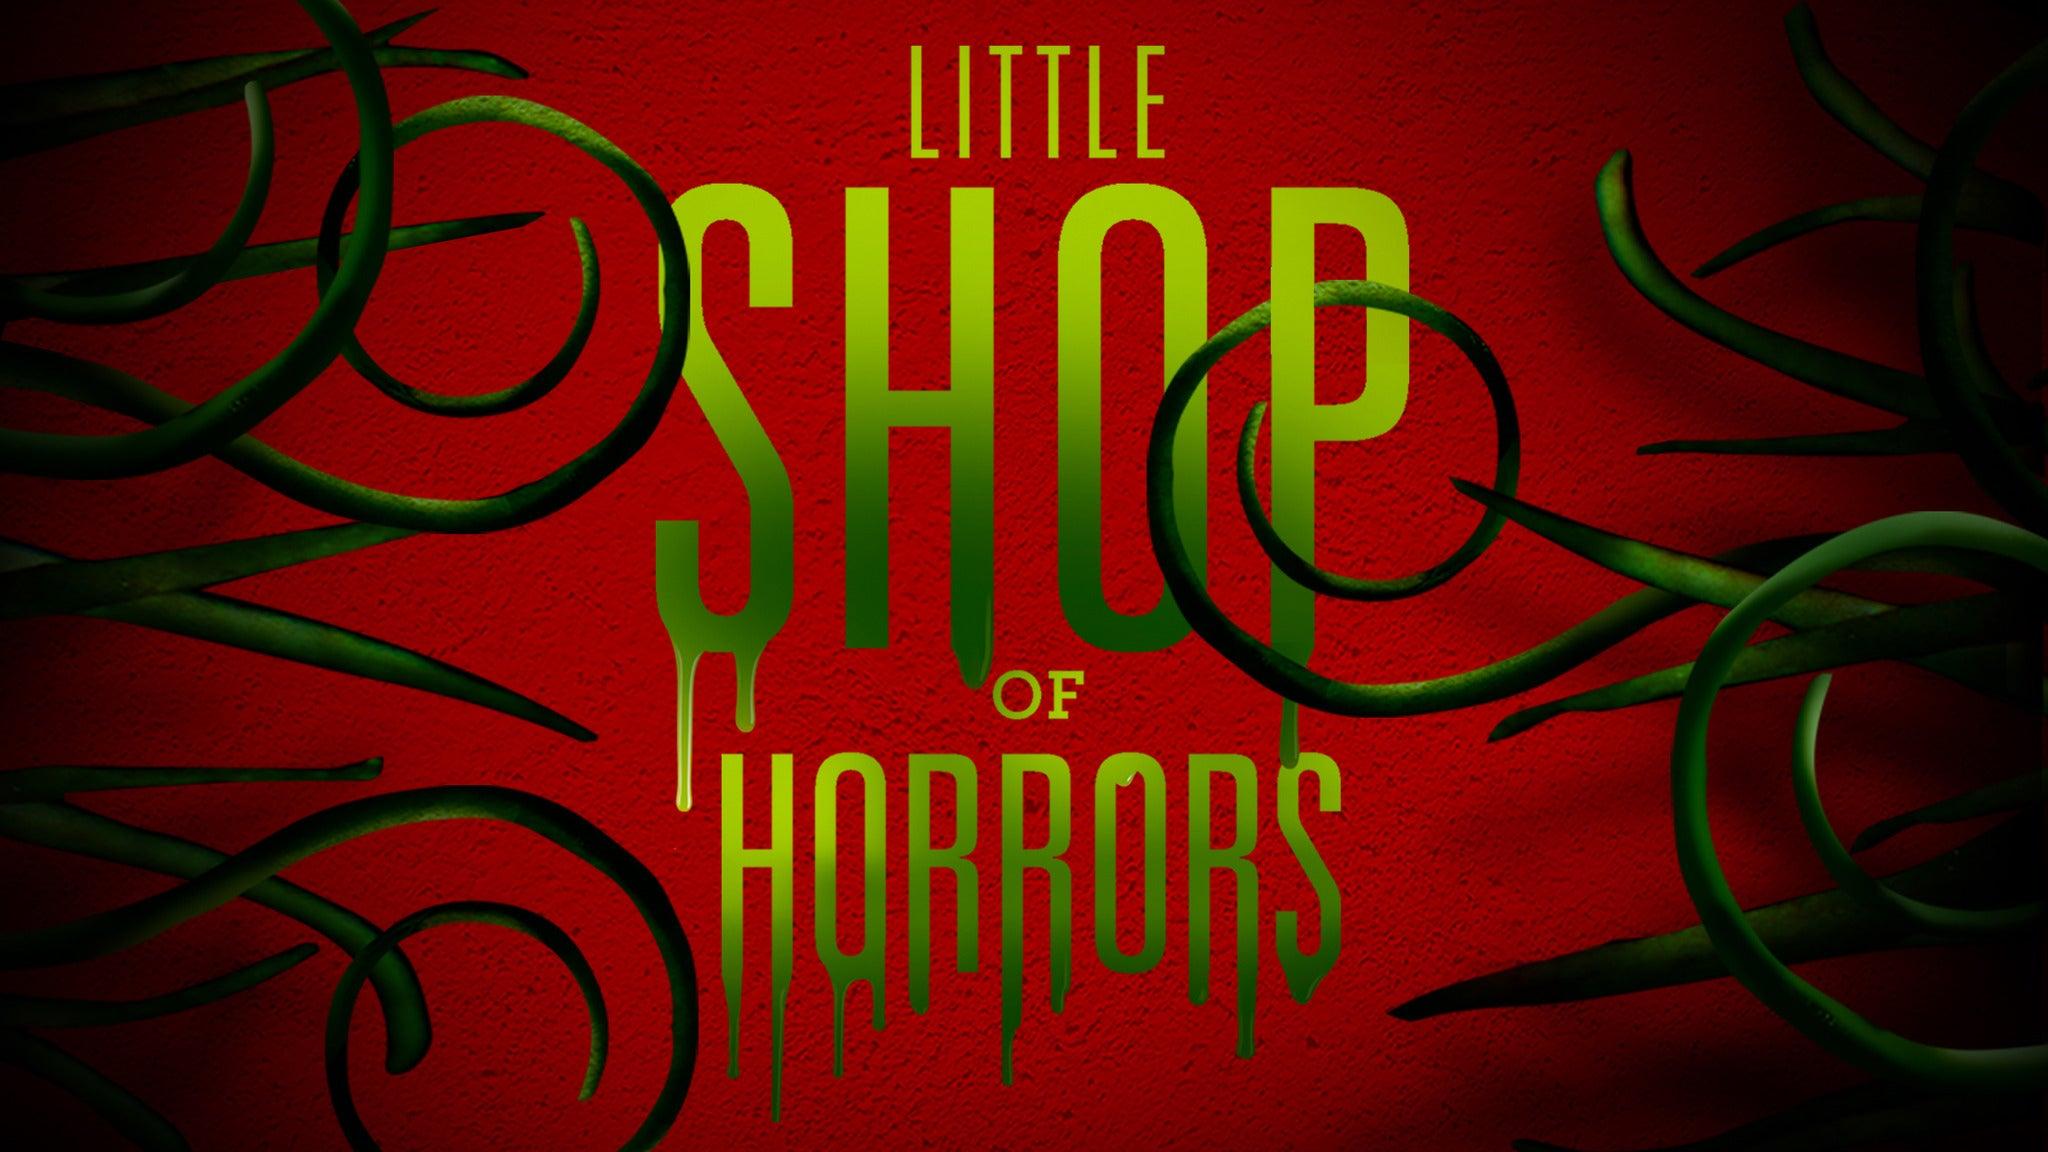 Drury Lane Theatre Presents: Little Shop Of Horrors